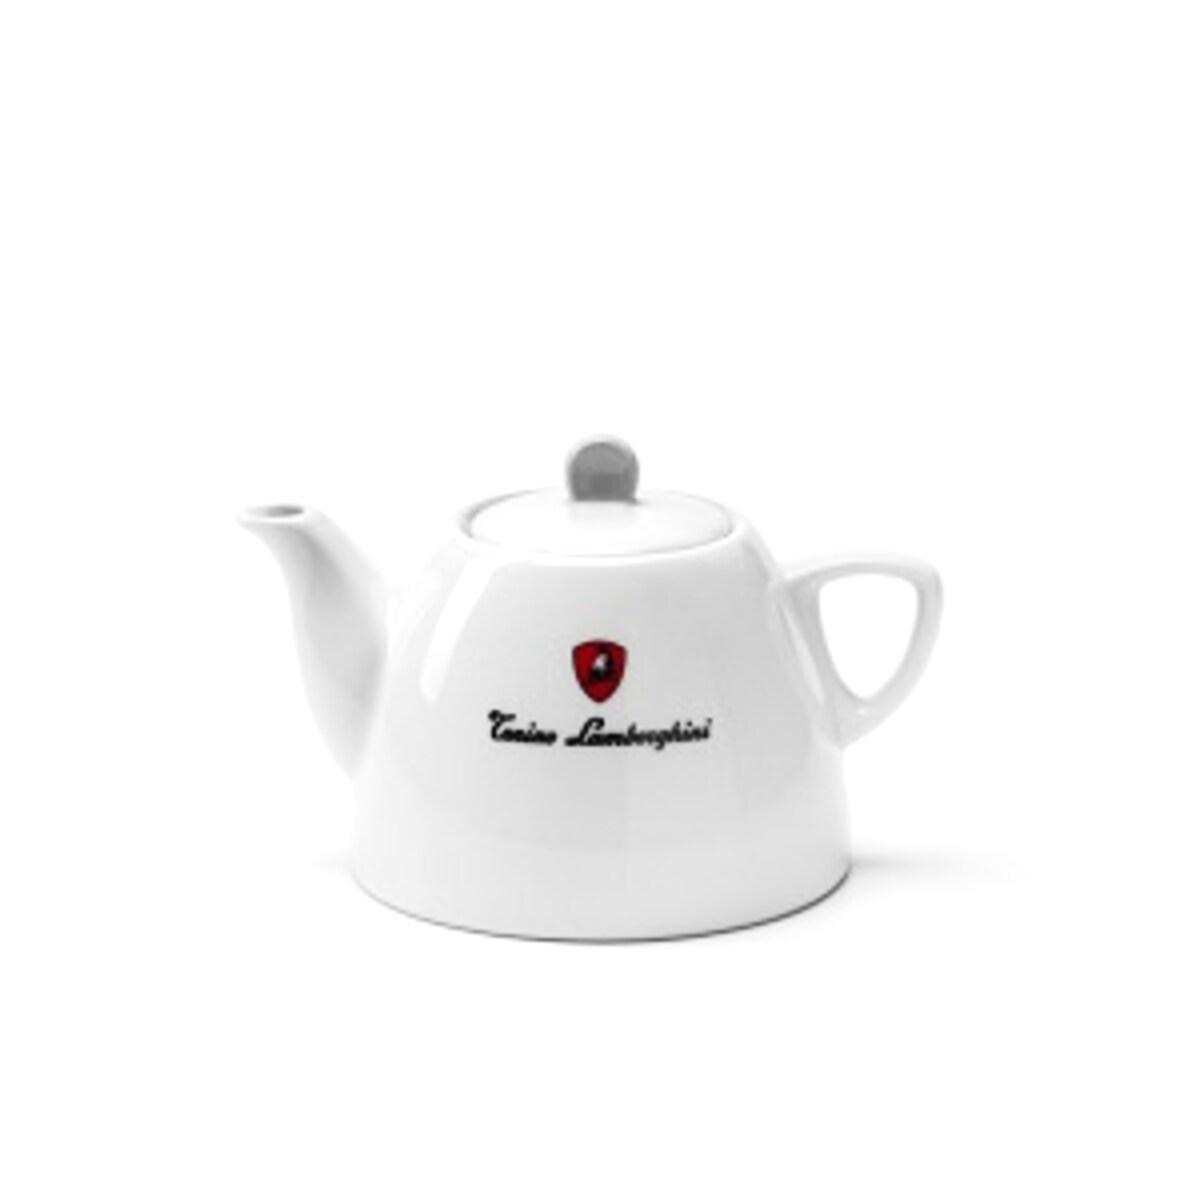 Ceainic din porțelan Tonino Lamborghini